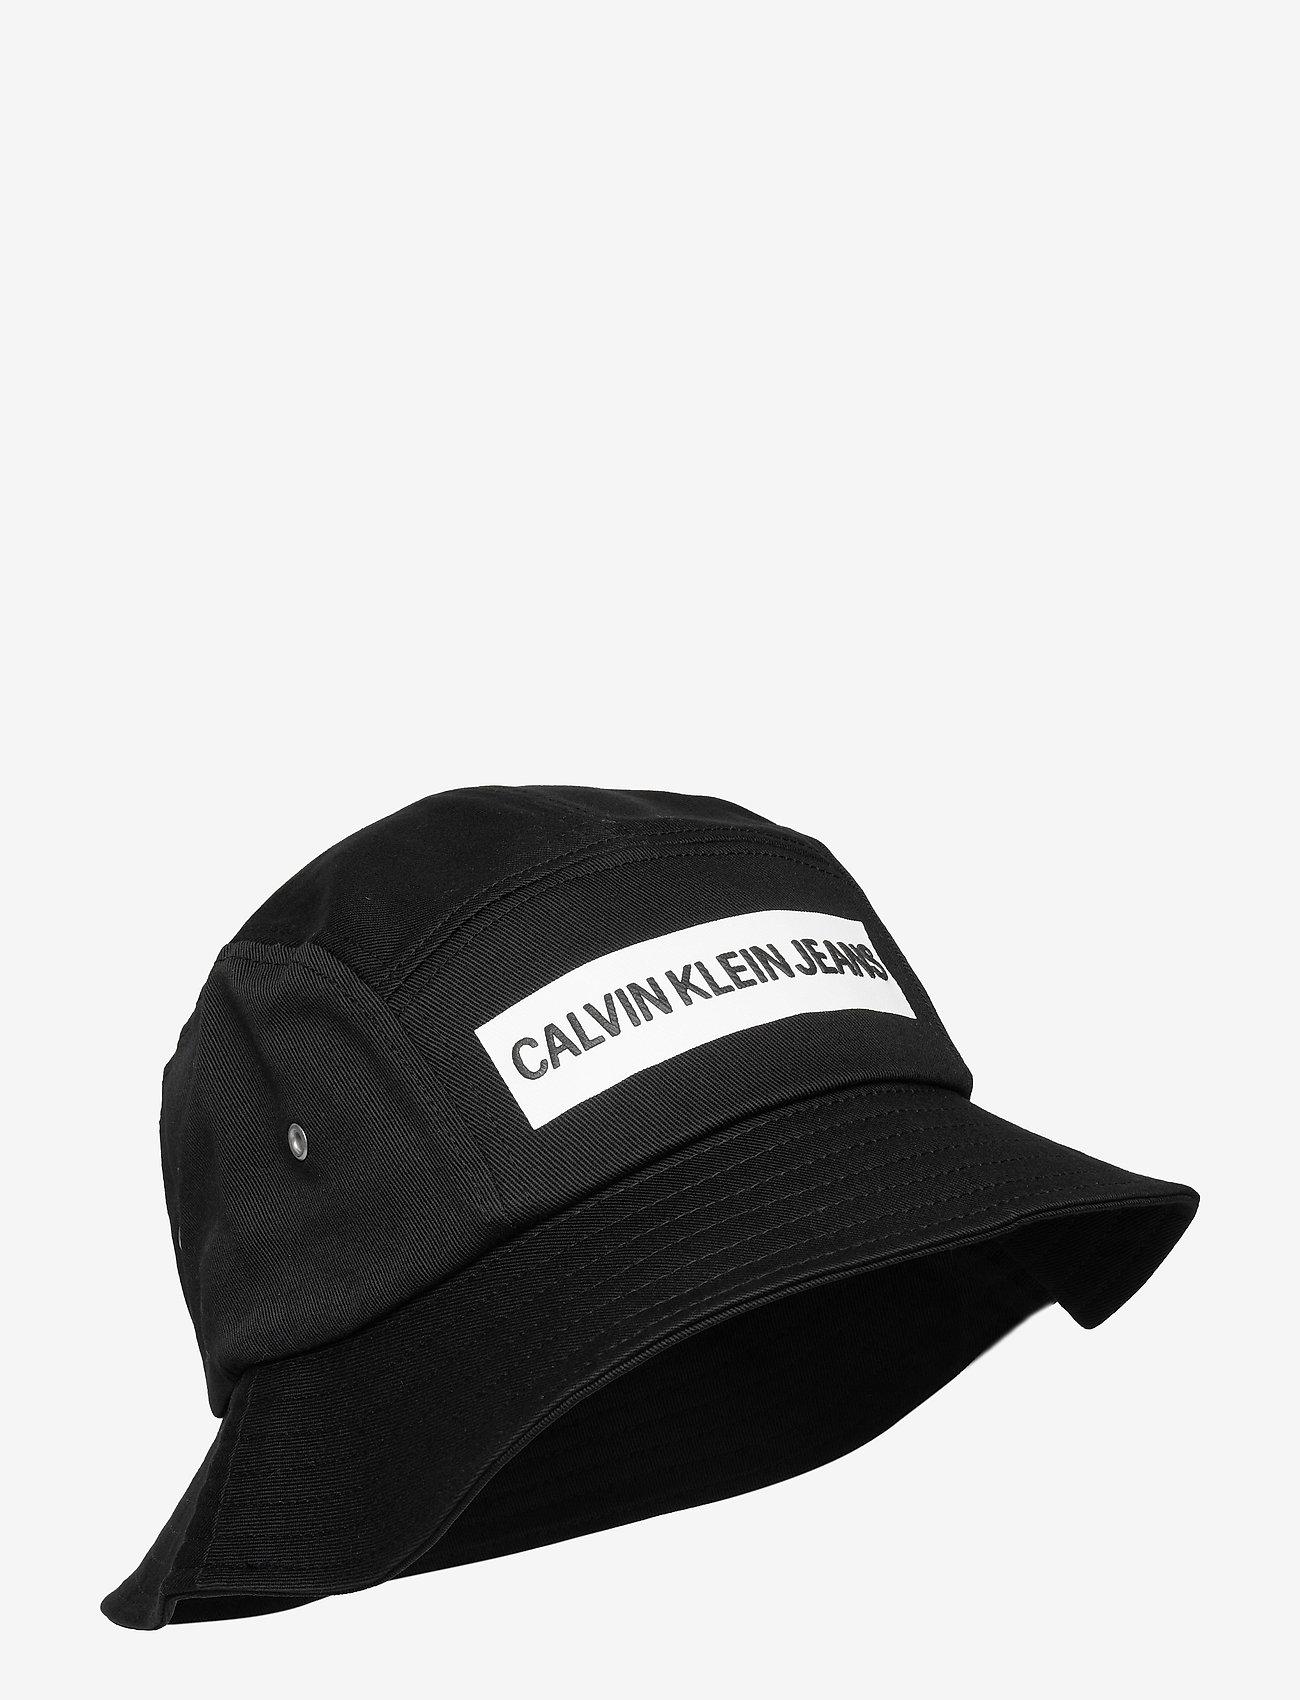 Calvin Klein - BUCKET INSTITUTIONAL - bucket hats - black - 0